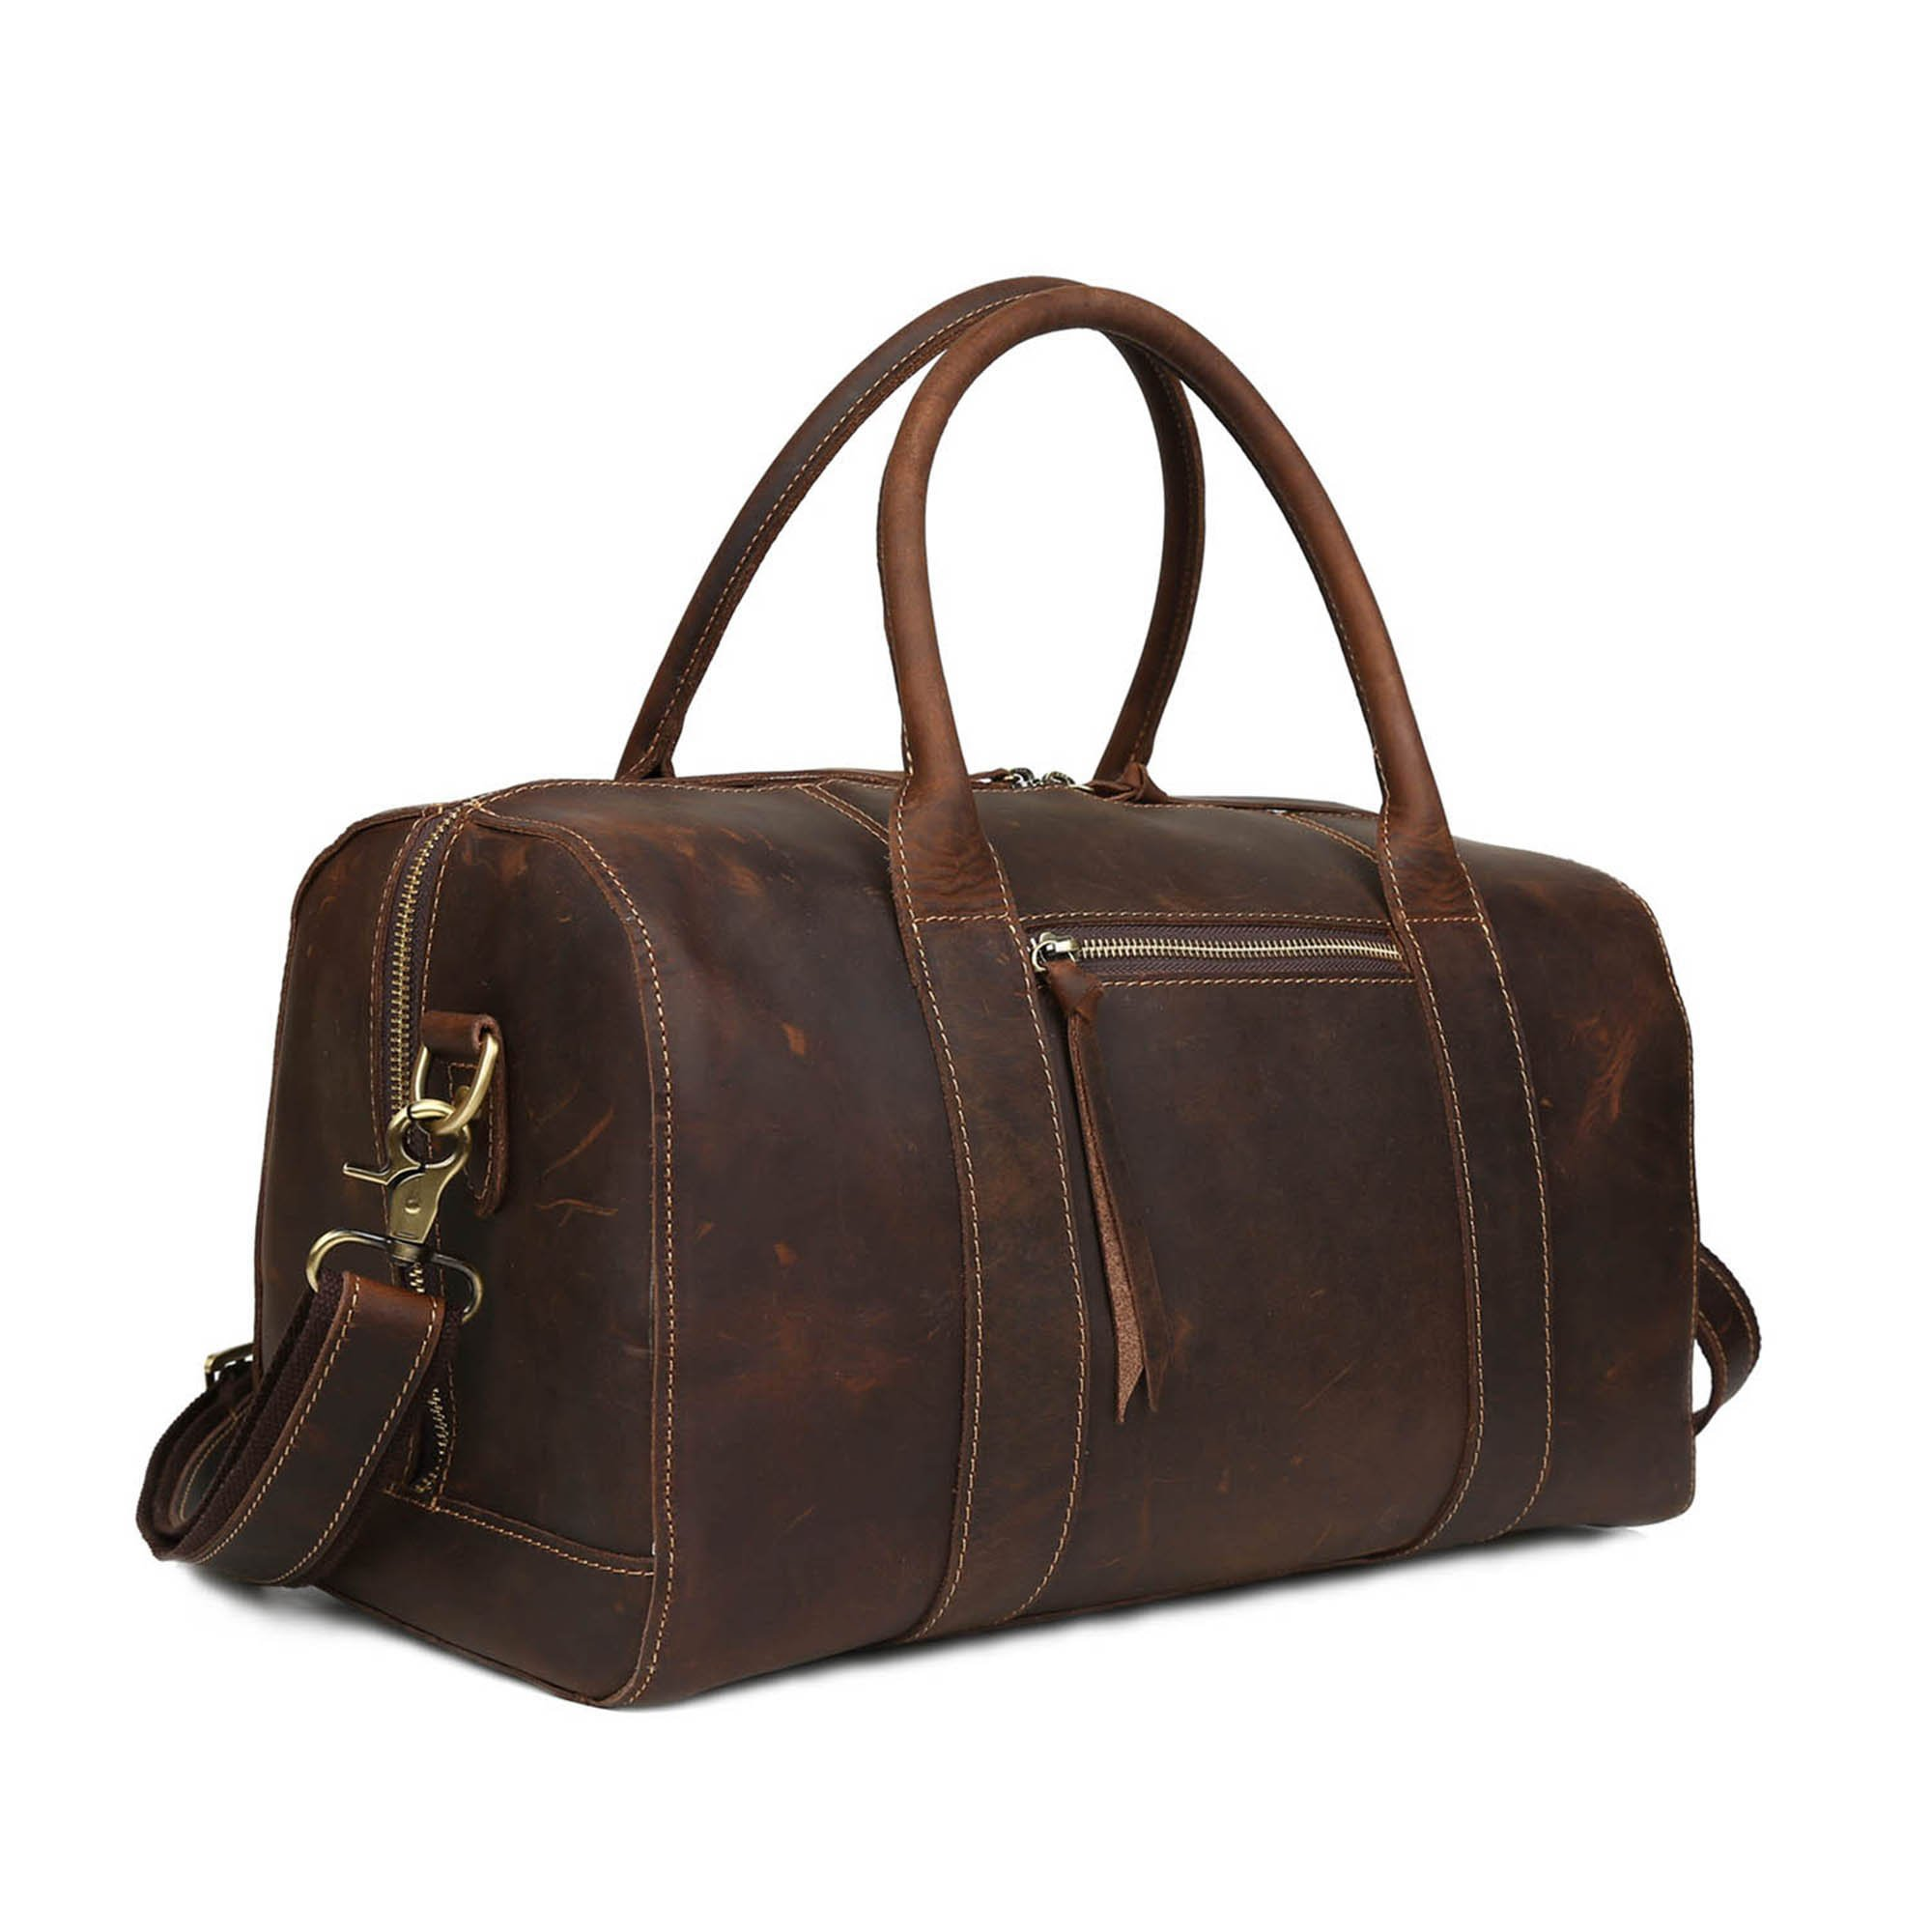 BAIGIO Women's Leather Travel Duffel Overnight/Weekend Bag Tote Duffle Luggage (Dark Brown)